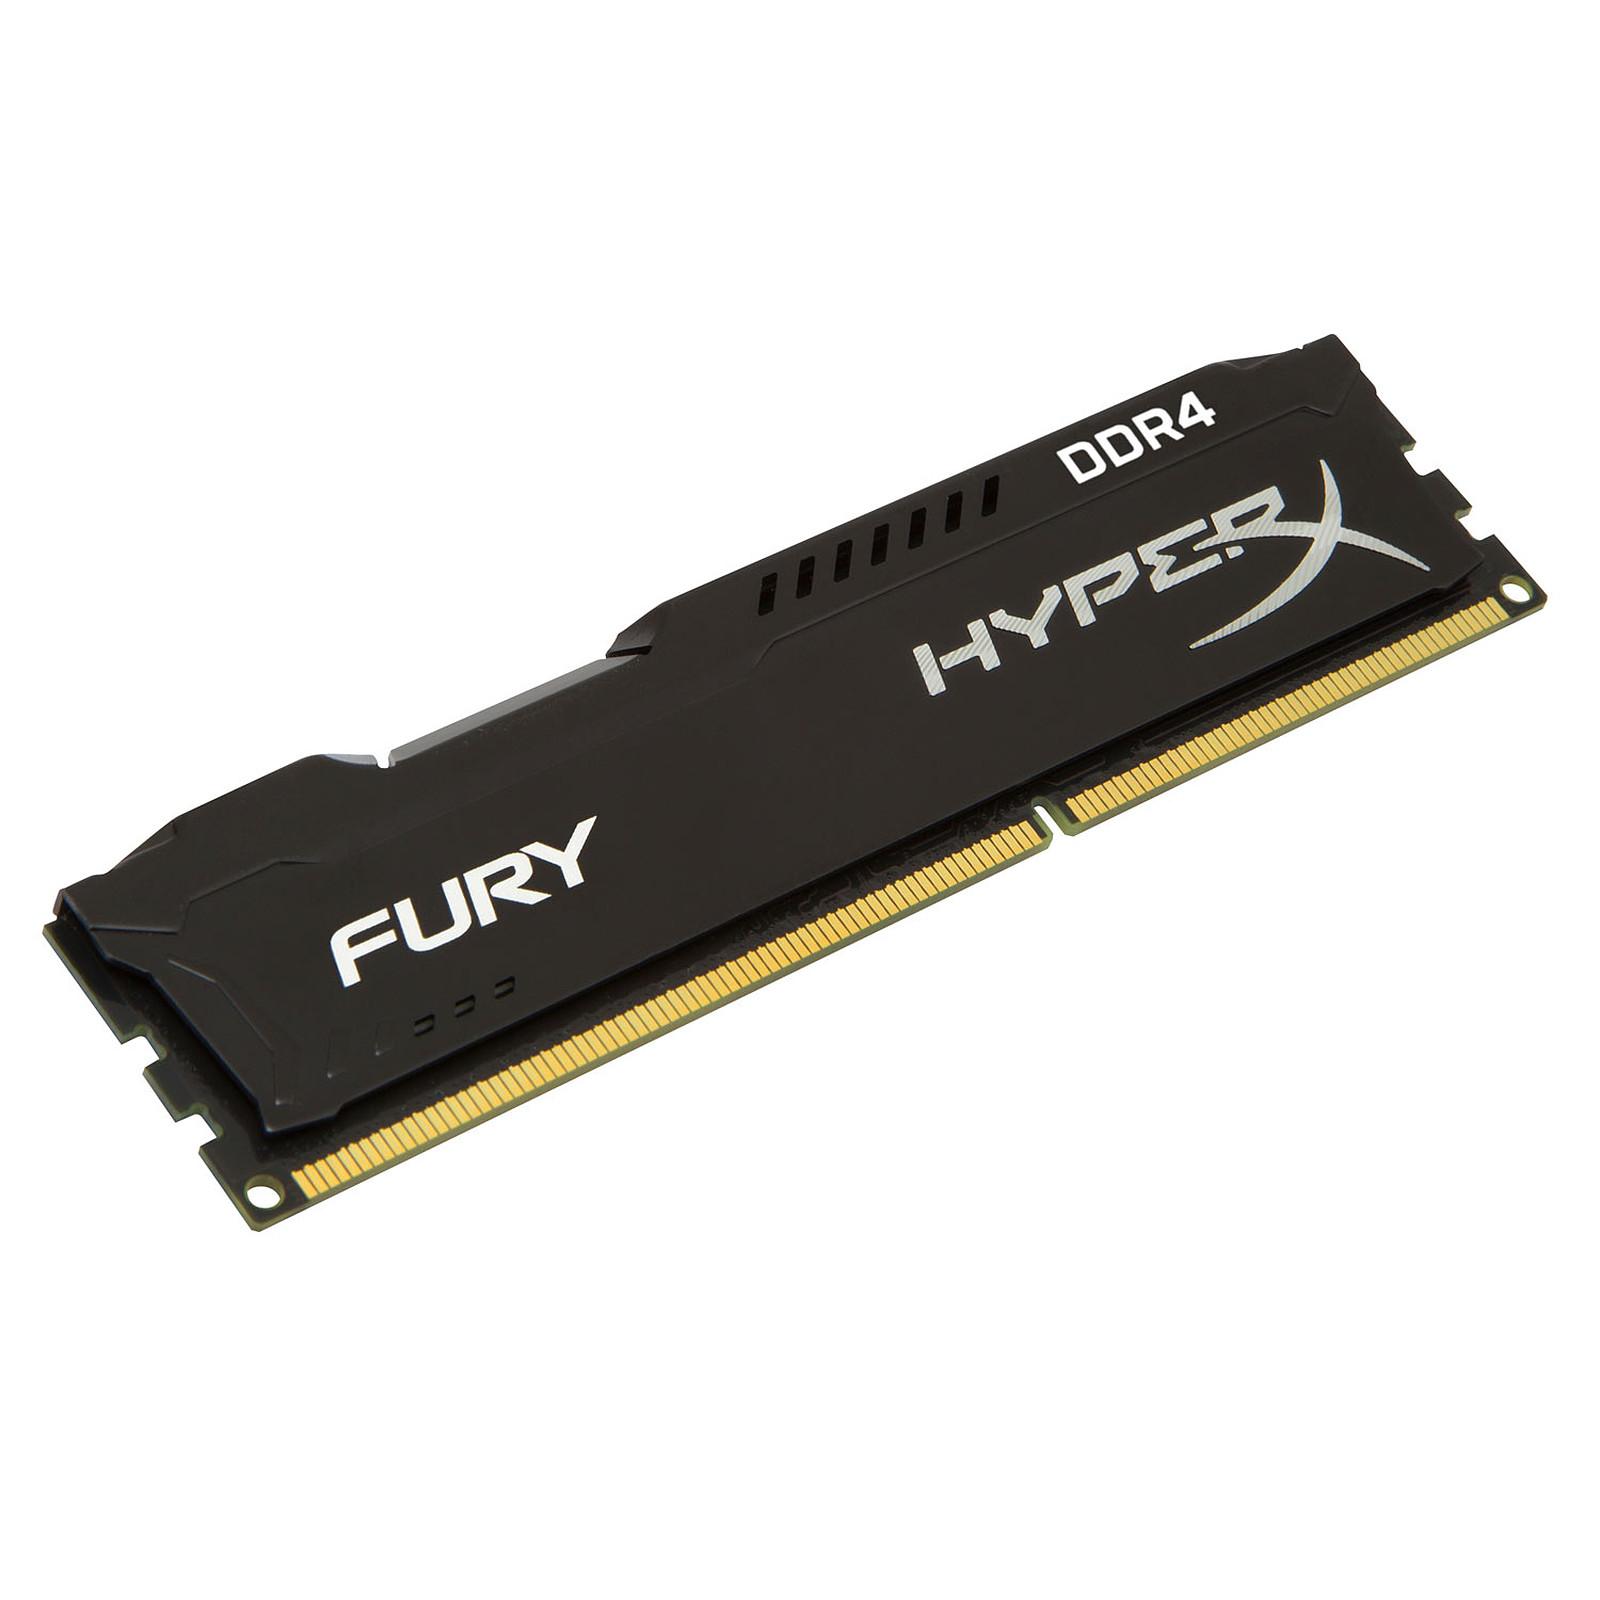 HyperX Fury Noir 8 Go DDR4 3466 MHz CL19